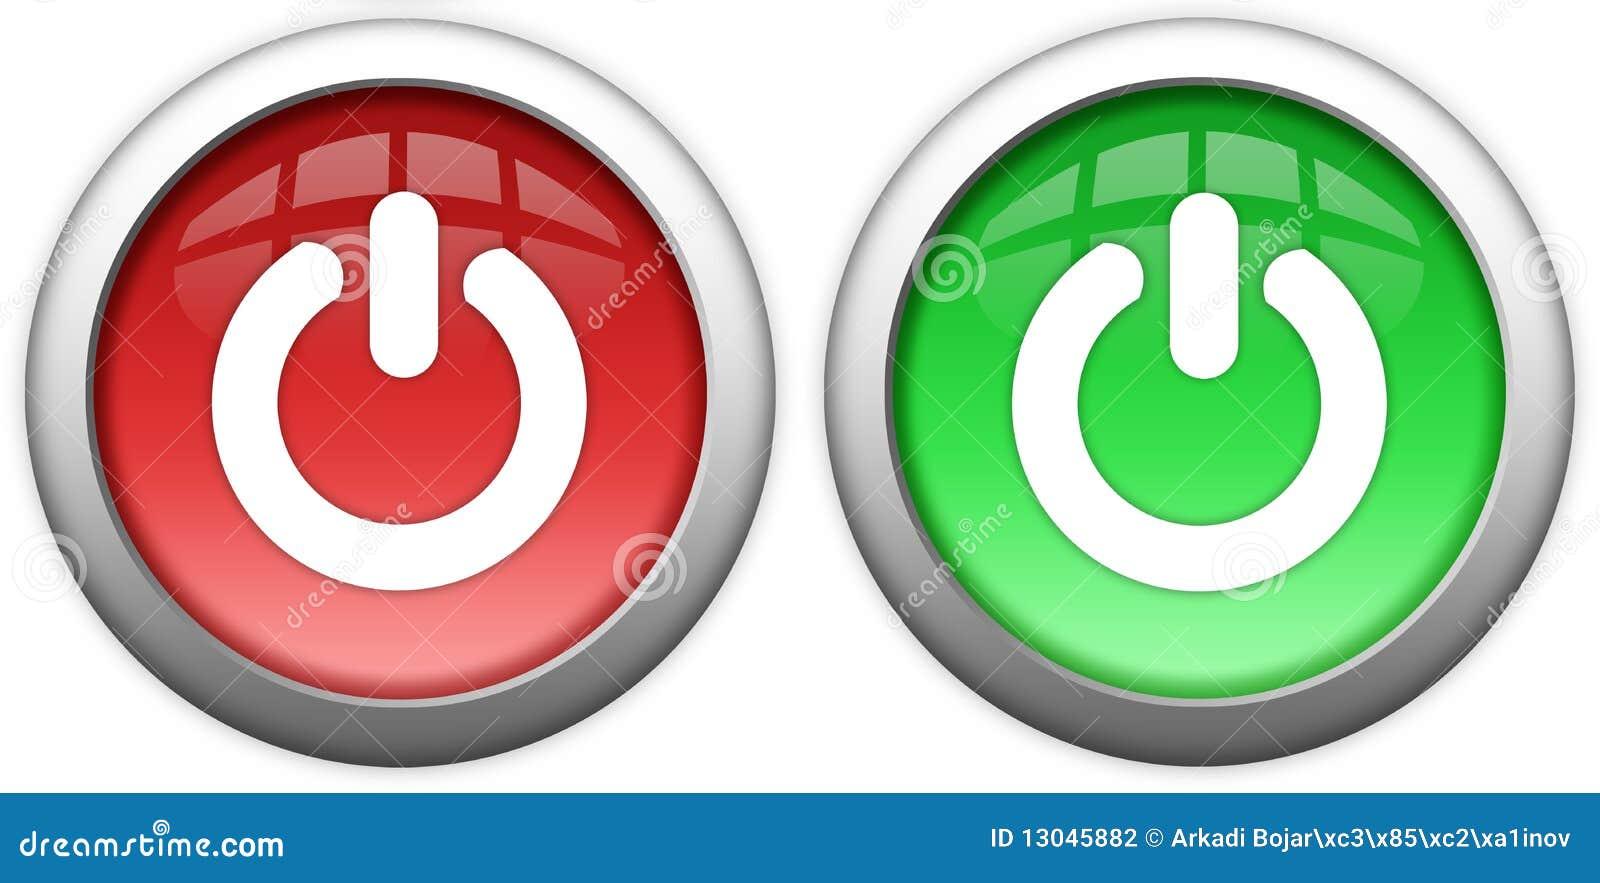 turn on off button stock illustration illustration of buttons